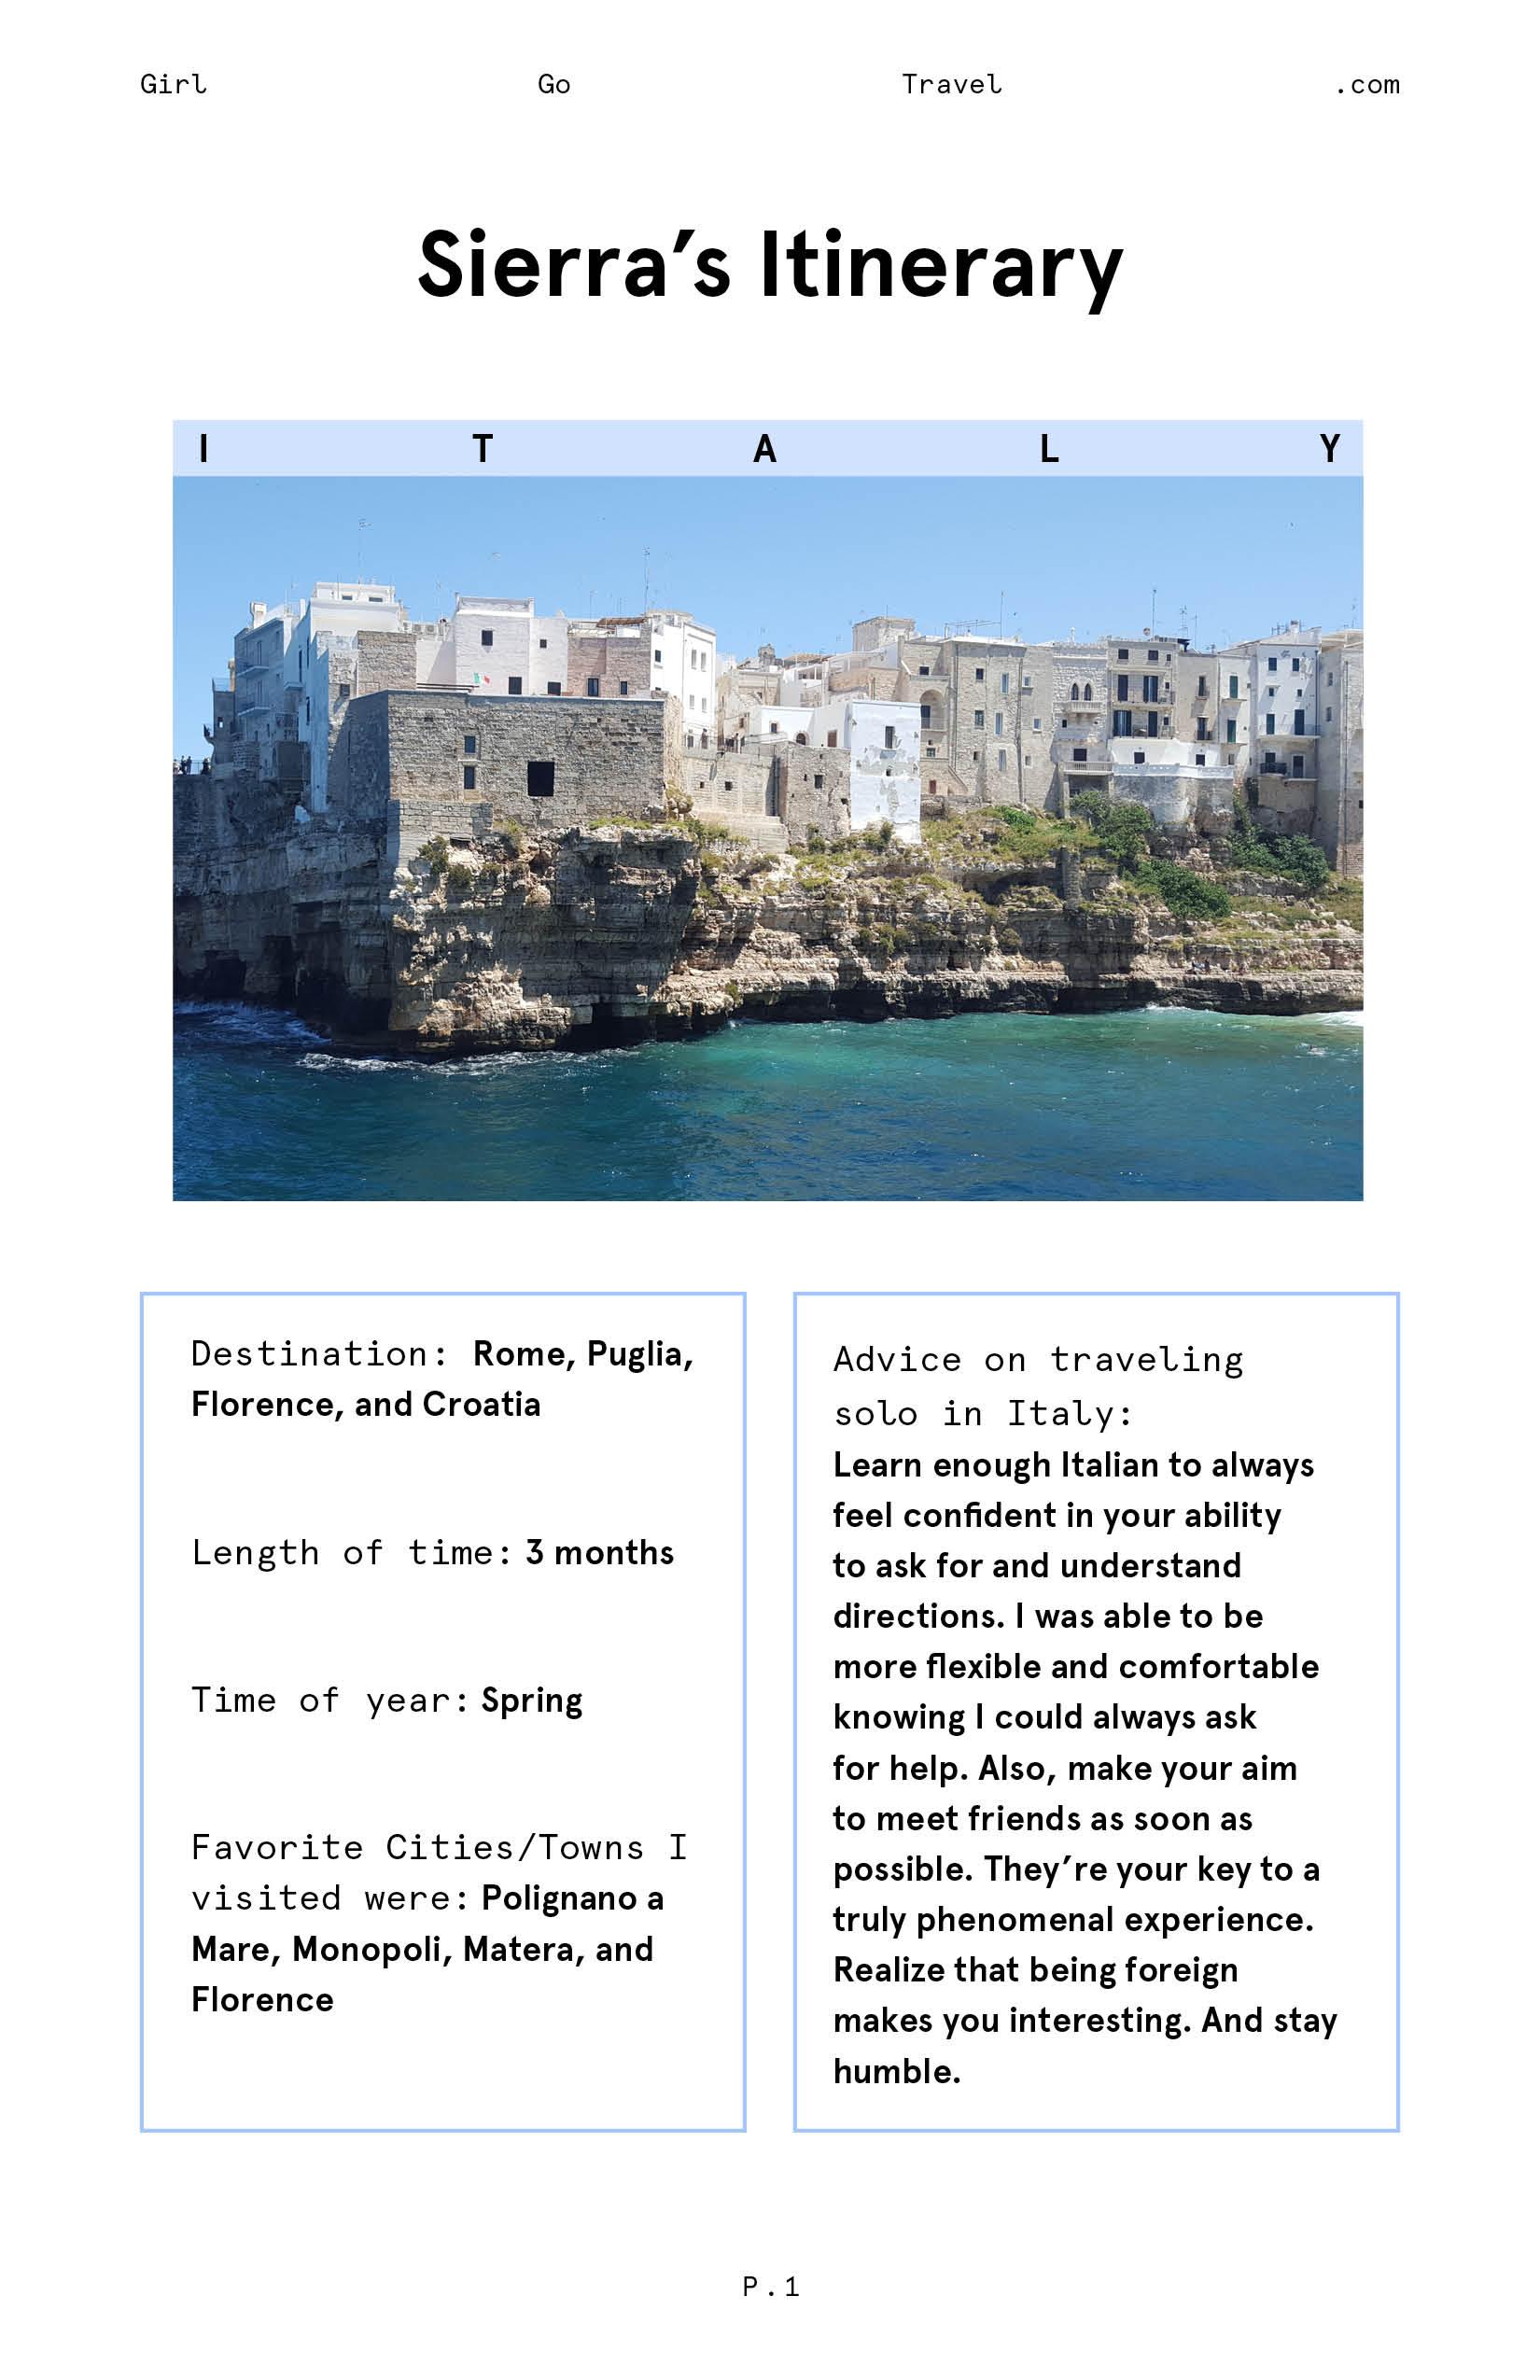 Sierra Italy Itinerary part 1